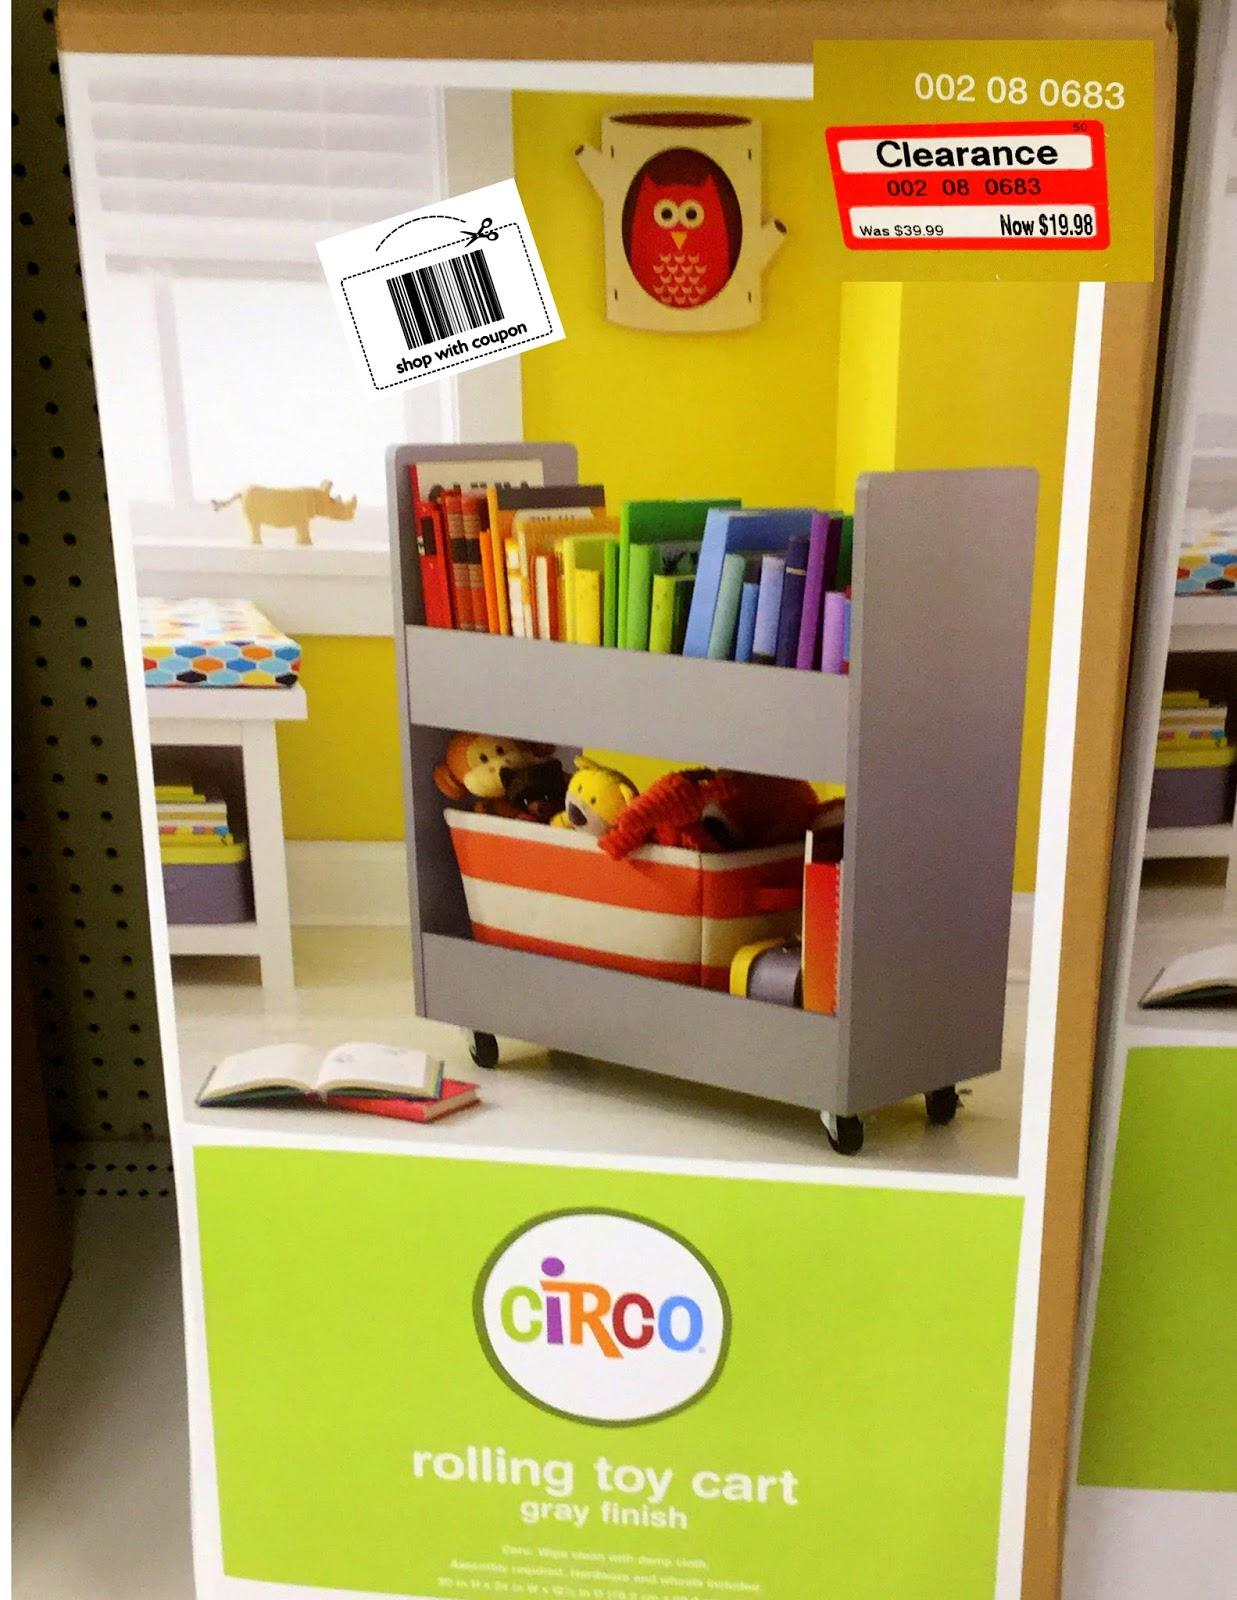 Circo Toy Storage Organizer Retailadvisor with measurements 1237 X 1600